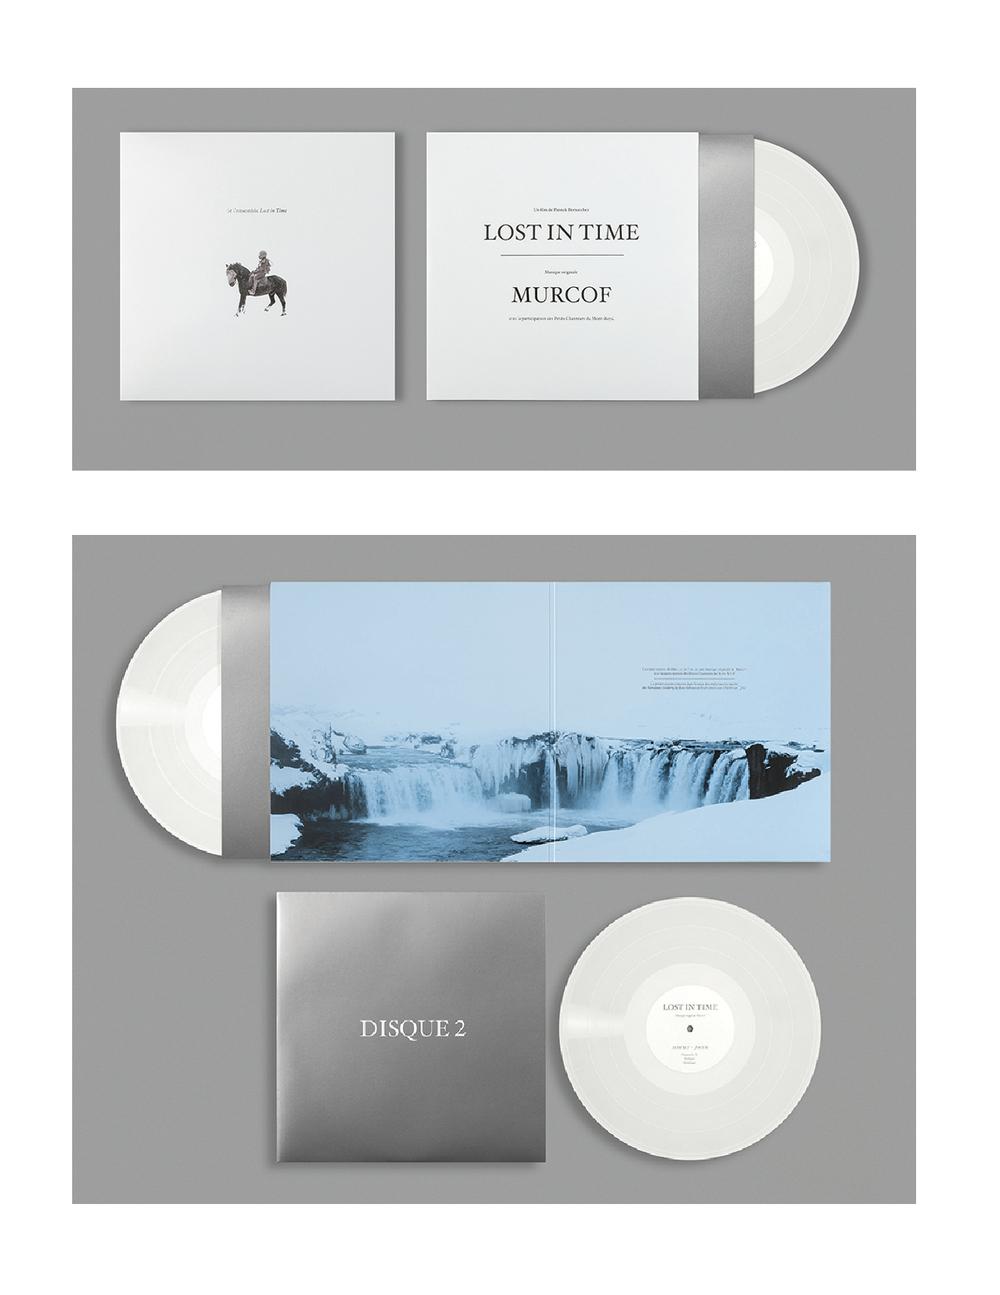 001_LOST IN TIME_MURCOF_album_02.jpg